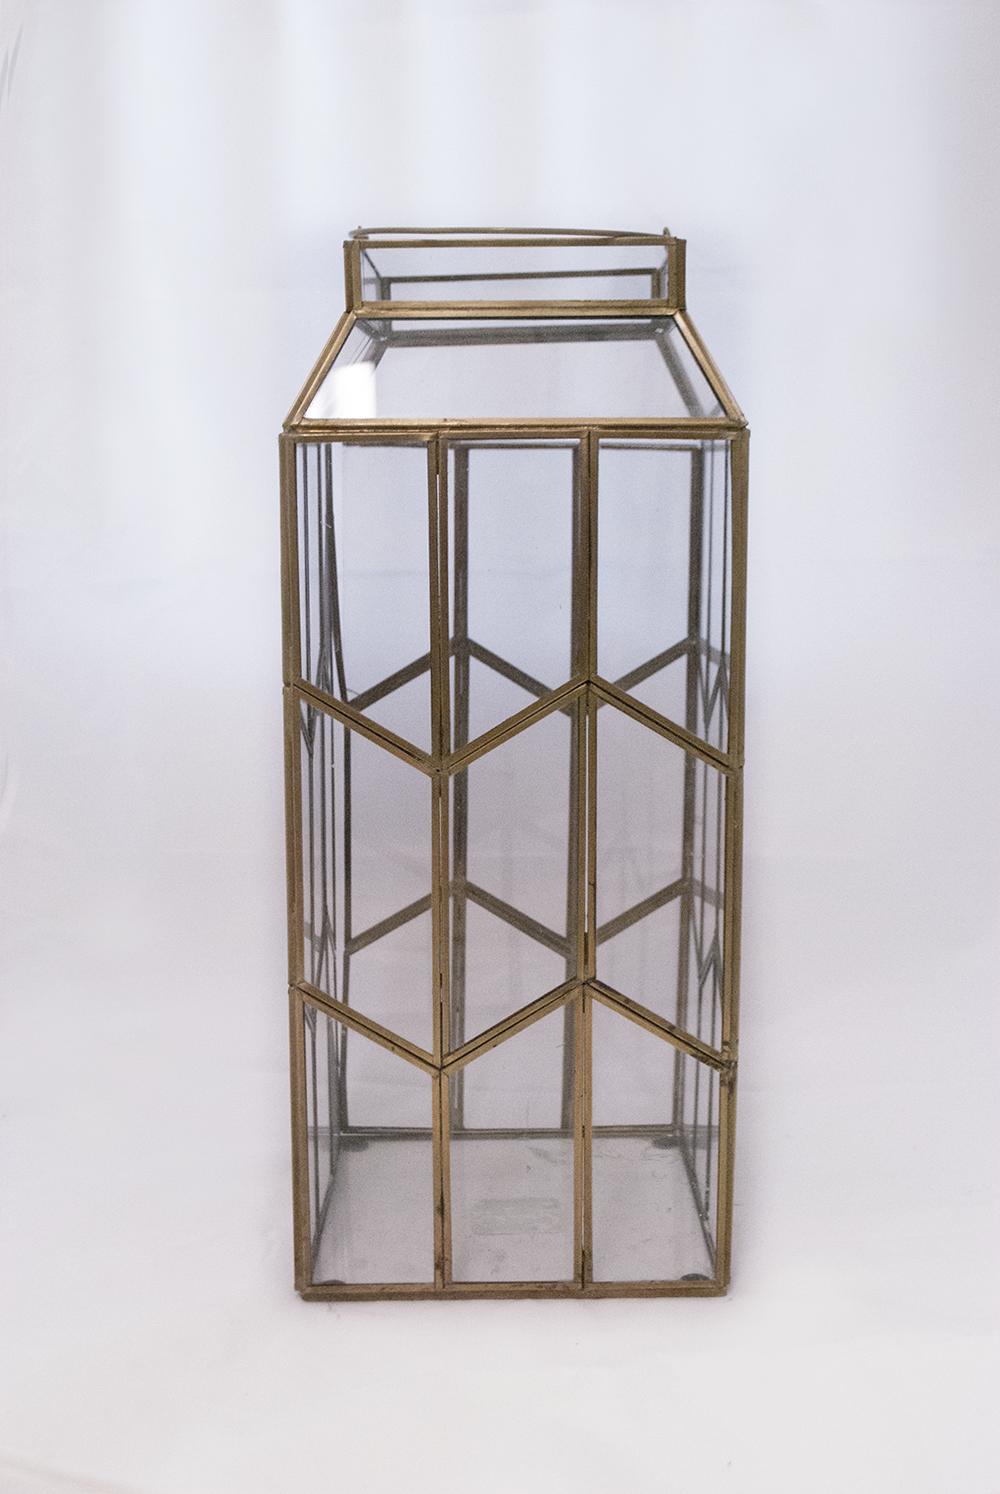 cleo Lantern   gold glass geometric  Quantity: 1  Price: $20.00